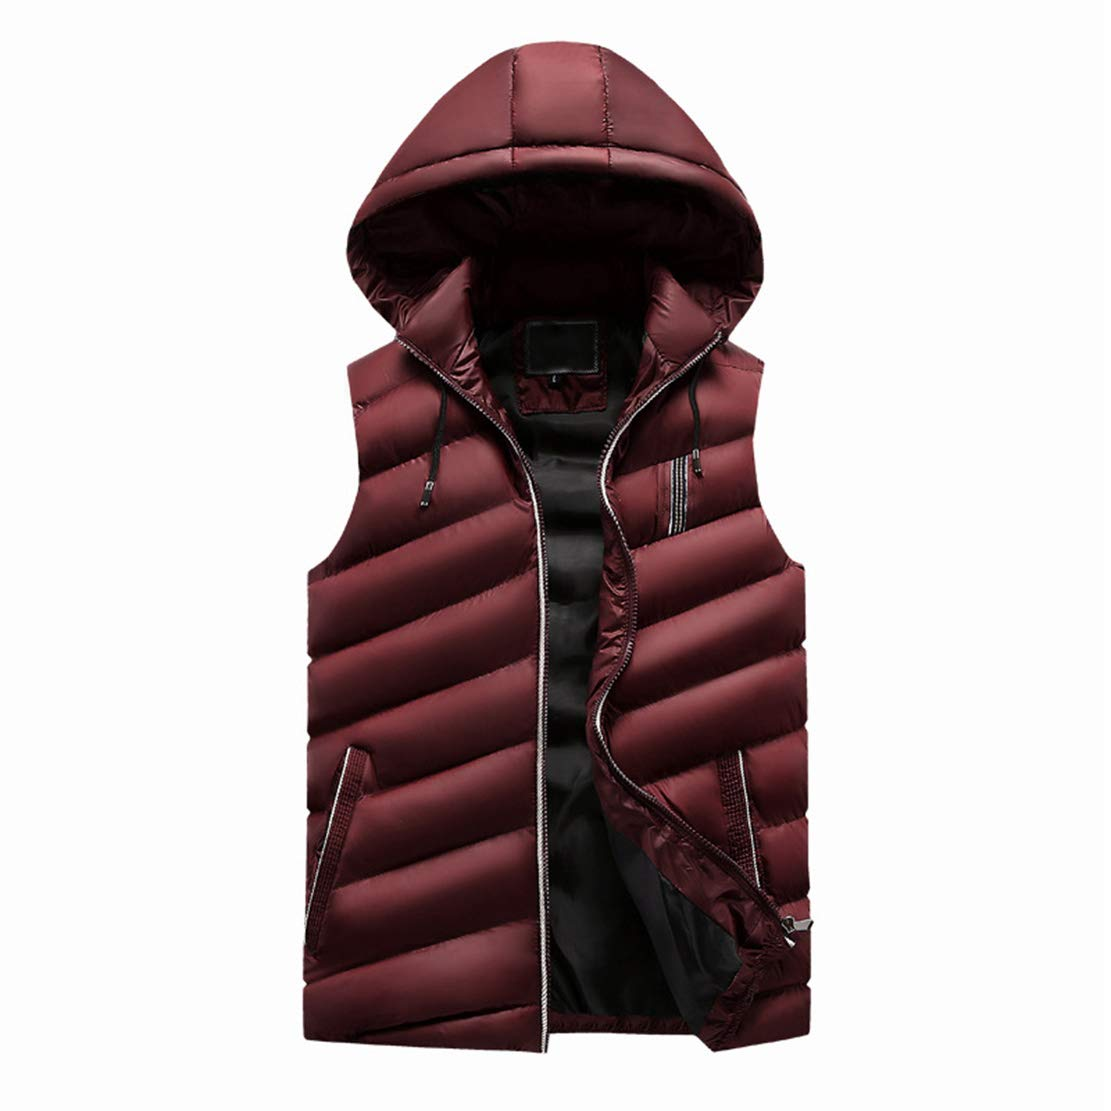 Men's down hooded vest jacket men's plus velvet vest cotton jacket exquisite and delicate edging comfortable and stylish